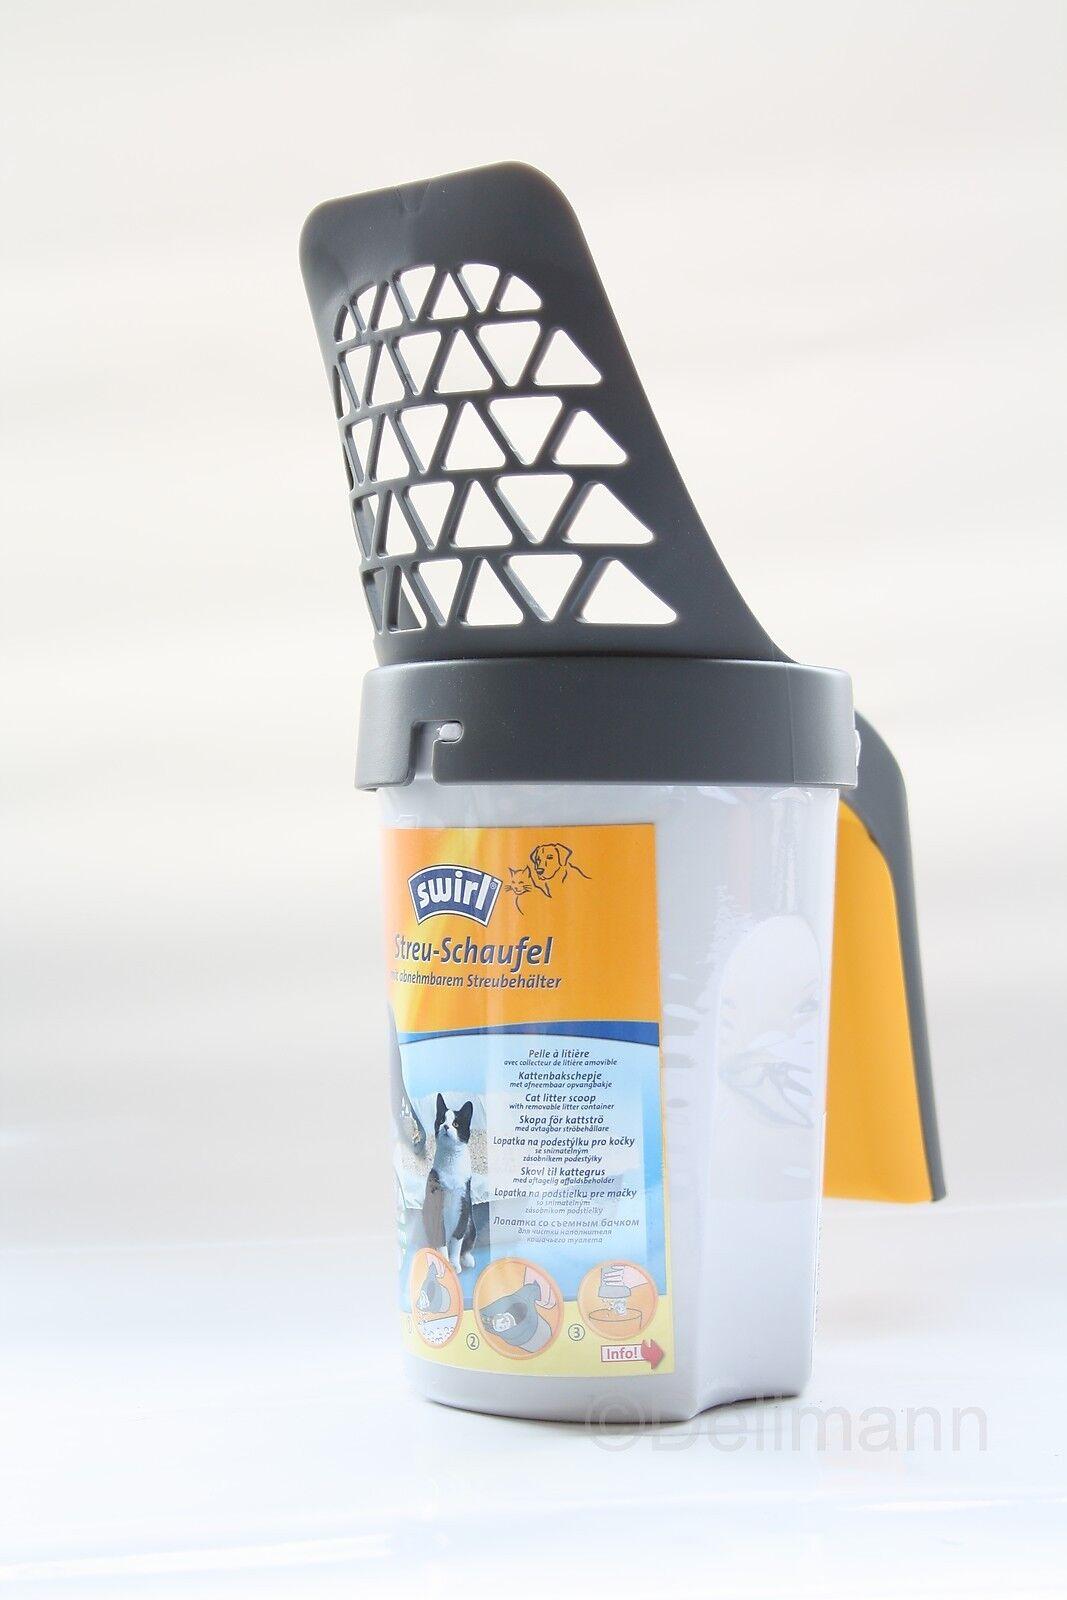 Swirl Streuschaufel Streu-Schaufel  4-6 mm für Katzenstreu - abnehmbares Sieb